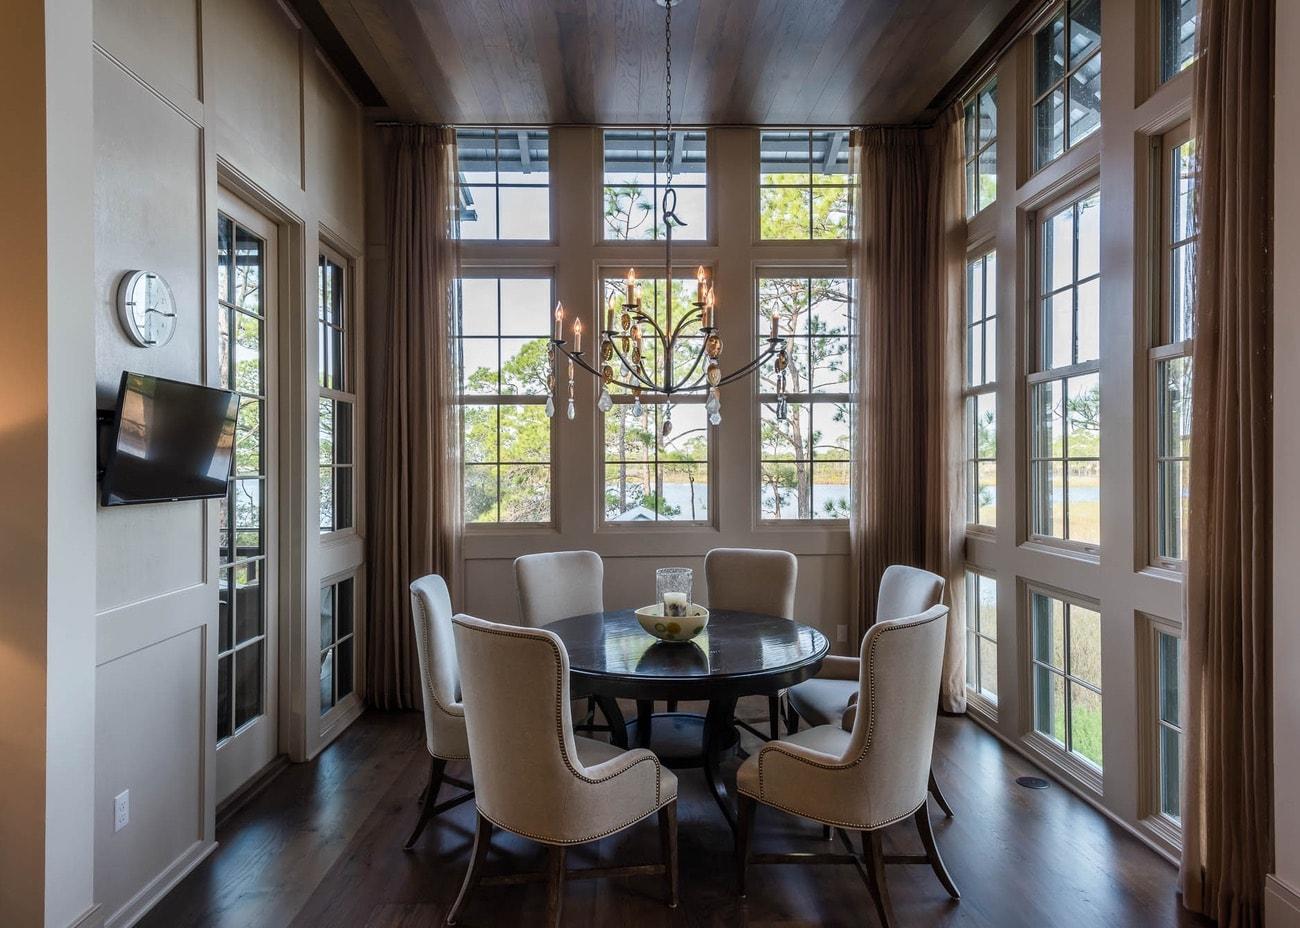 Custom home interior design by Sugar Beach Interiors, Santa Rosa Beach, Florida, Watercolor.